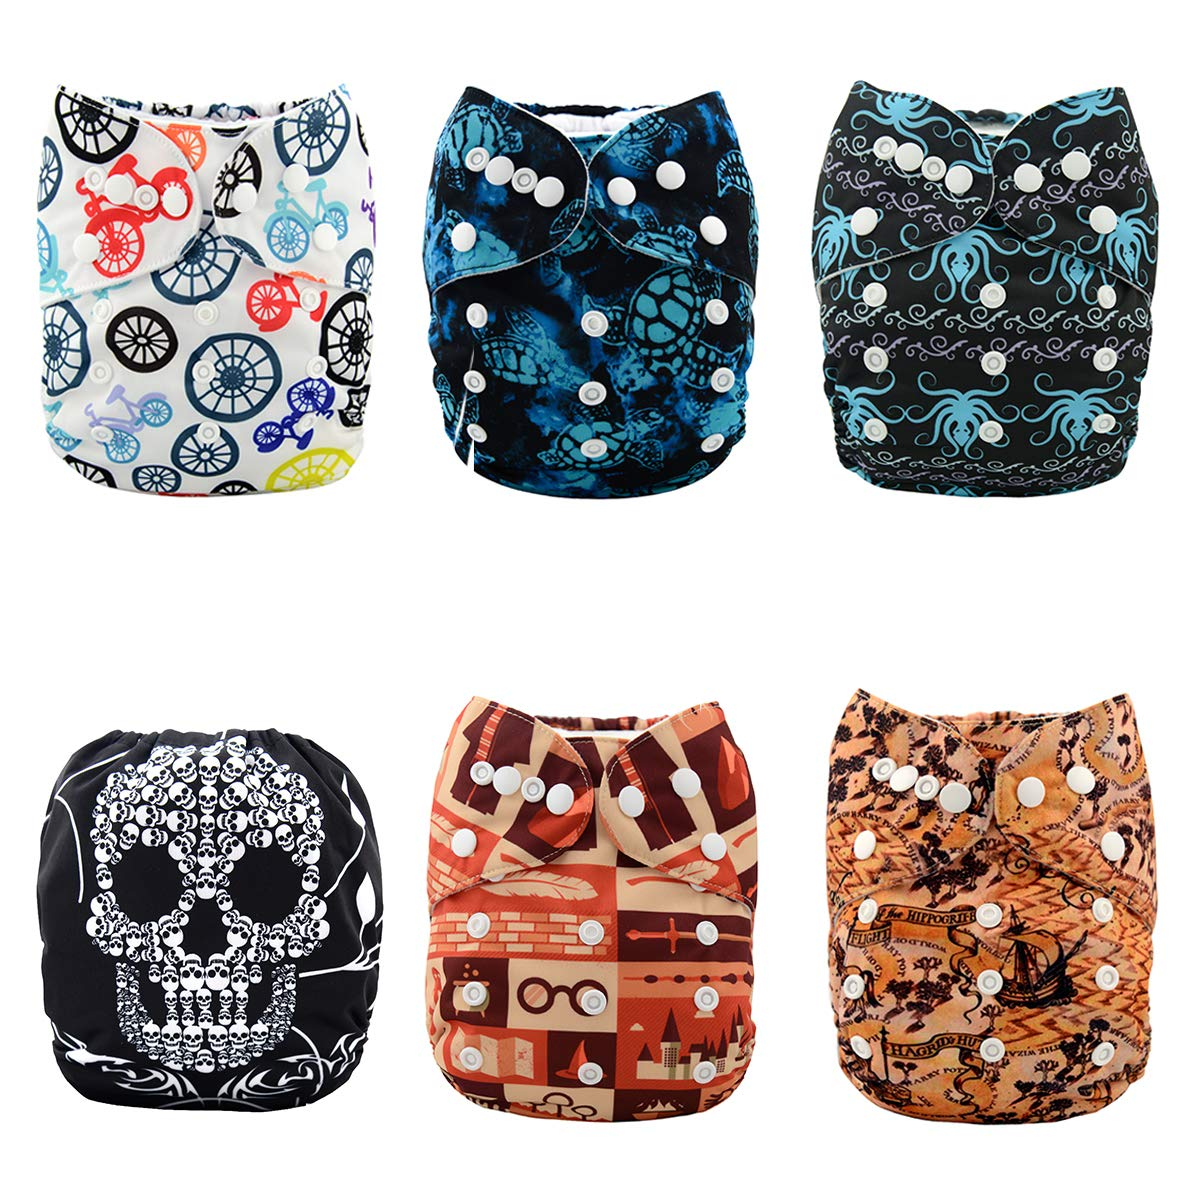 Alva Baby Pocket Cloth Nappies Reuseable Washable 6PCS Diapers + 12PCS Inserts 6DM27-EU Alvababy